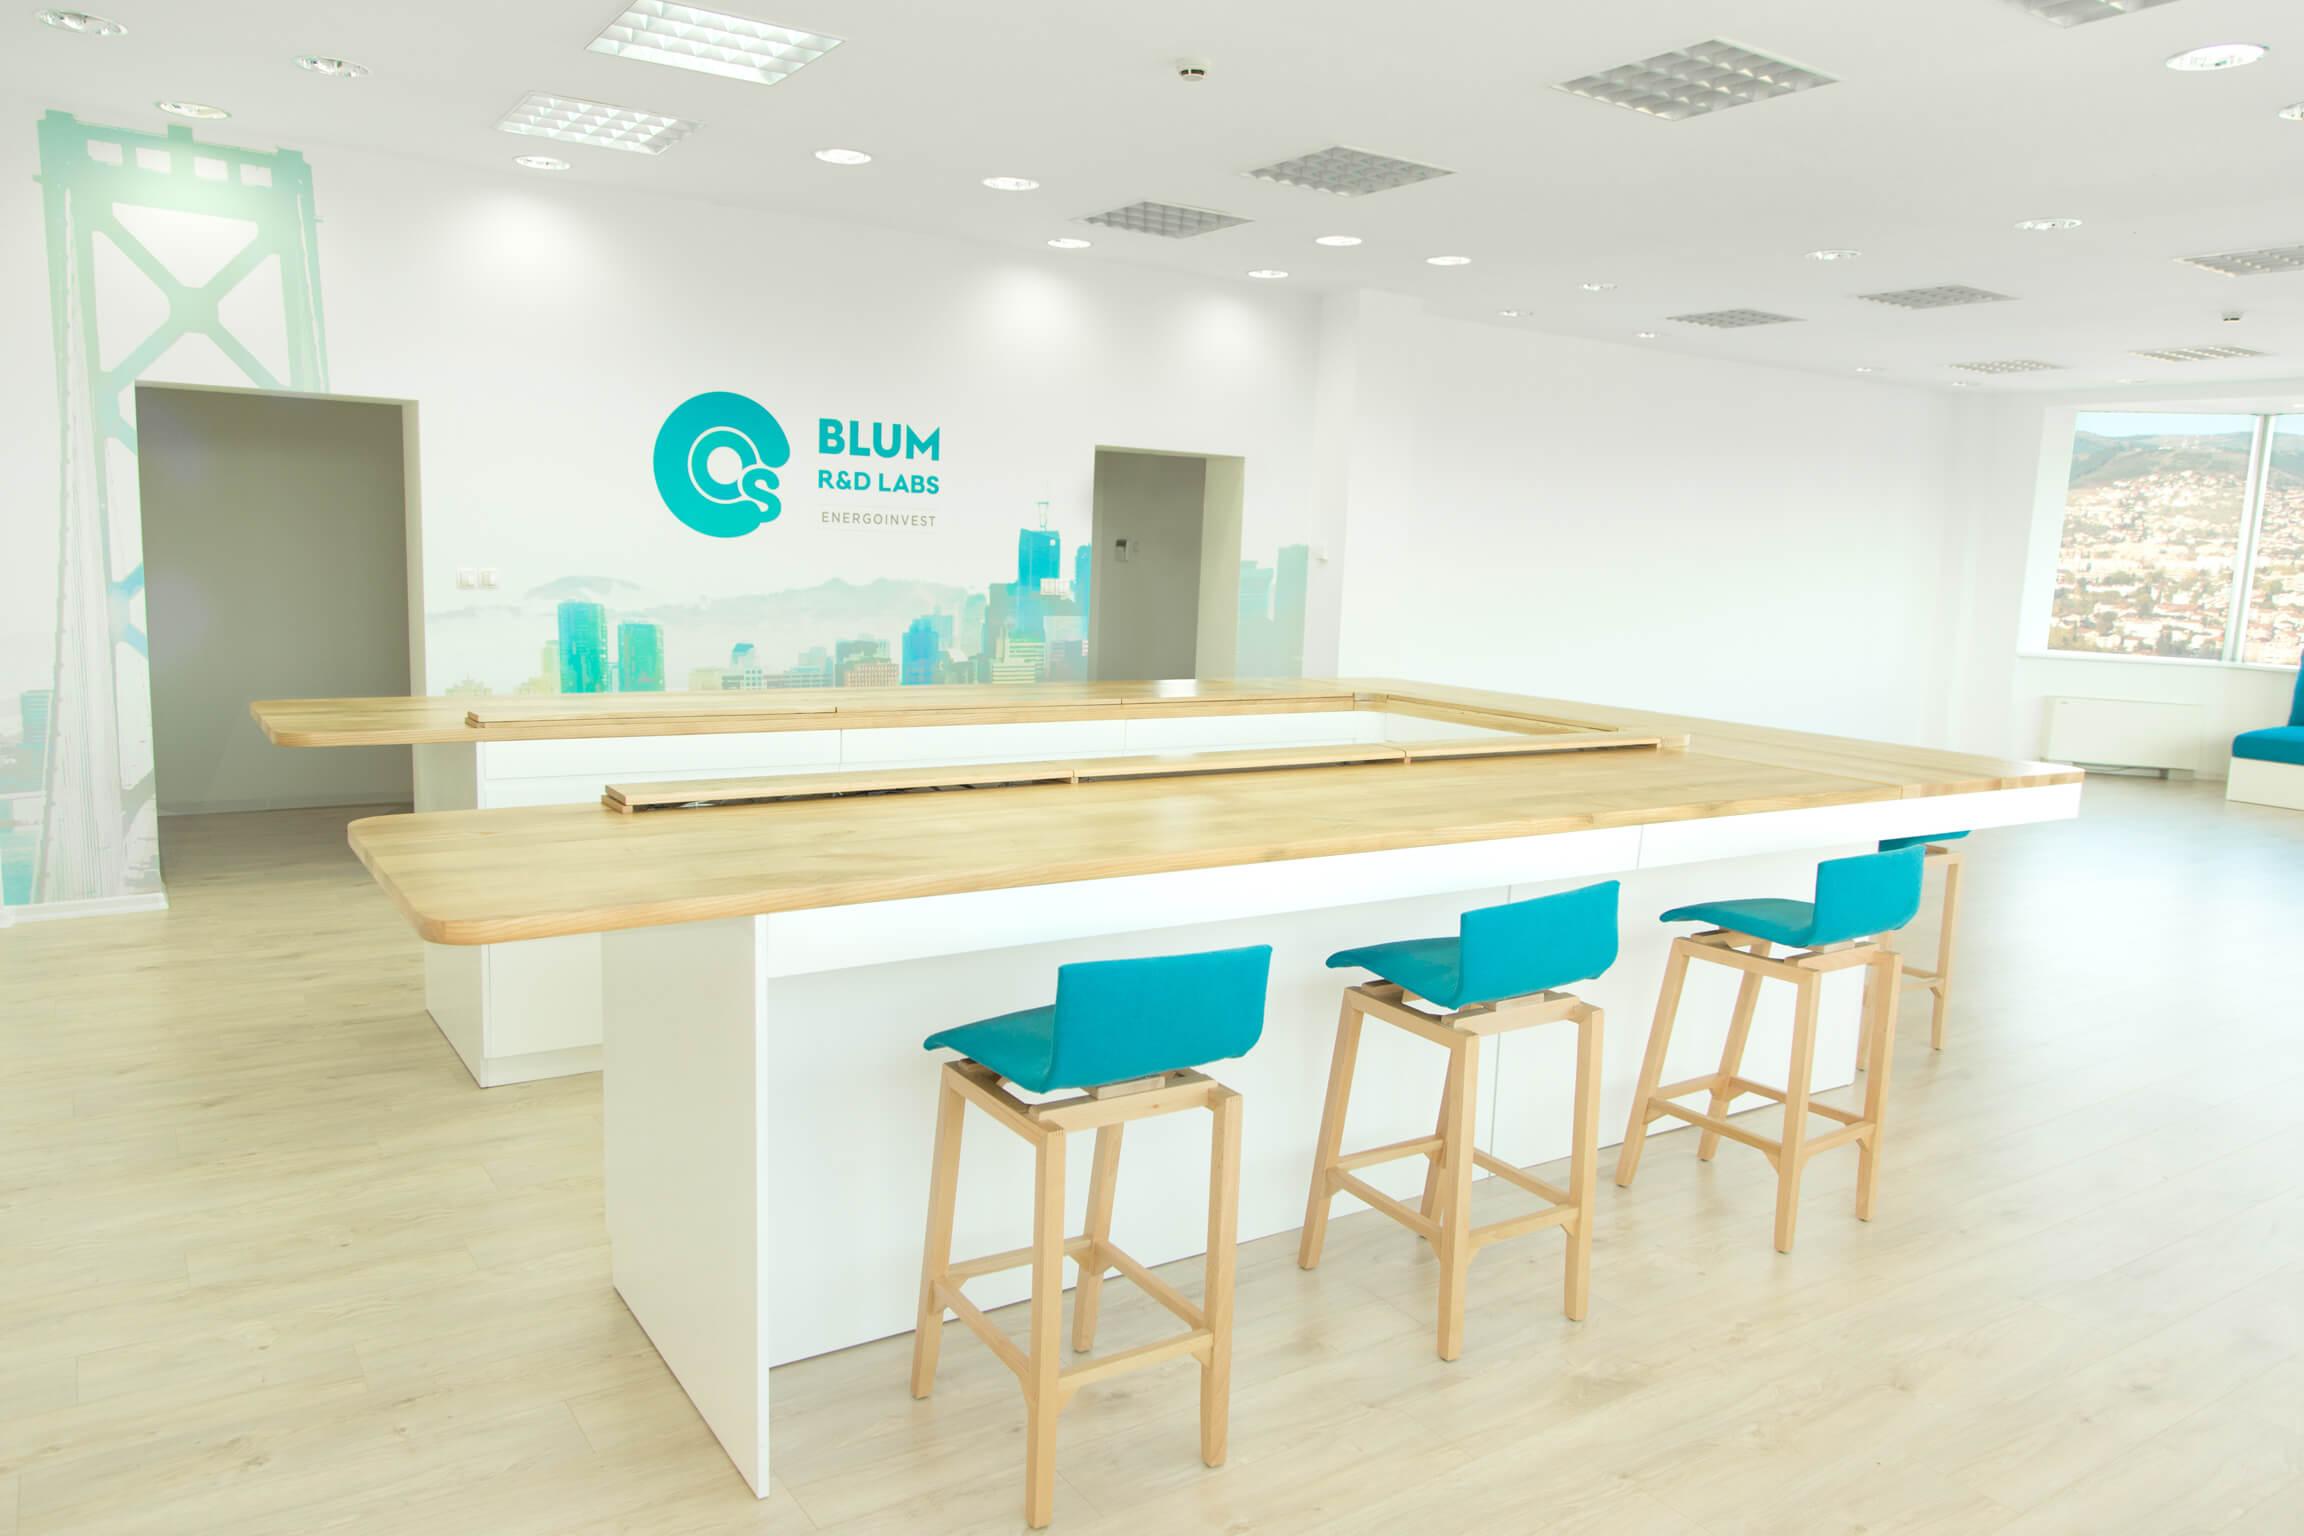 CityOS Blum Labs by Energoinvest